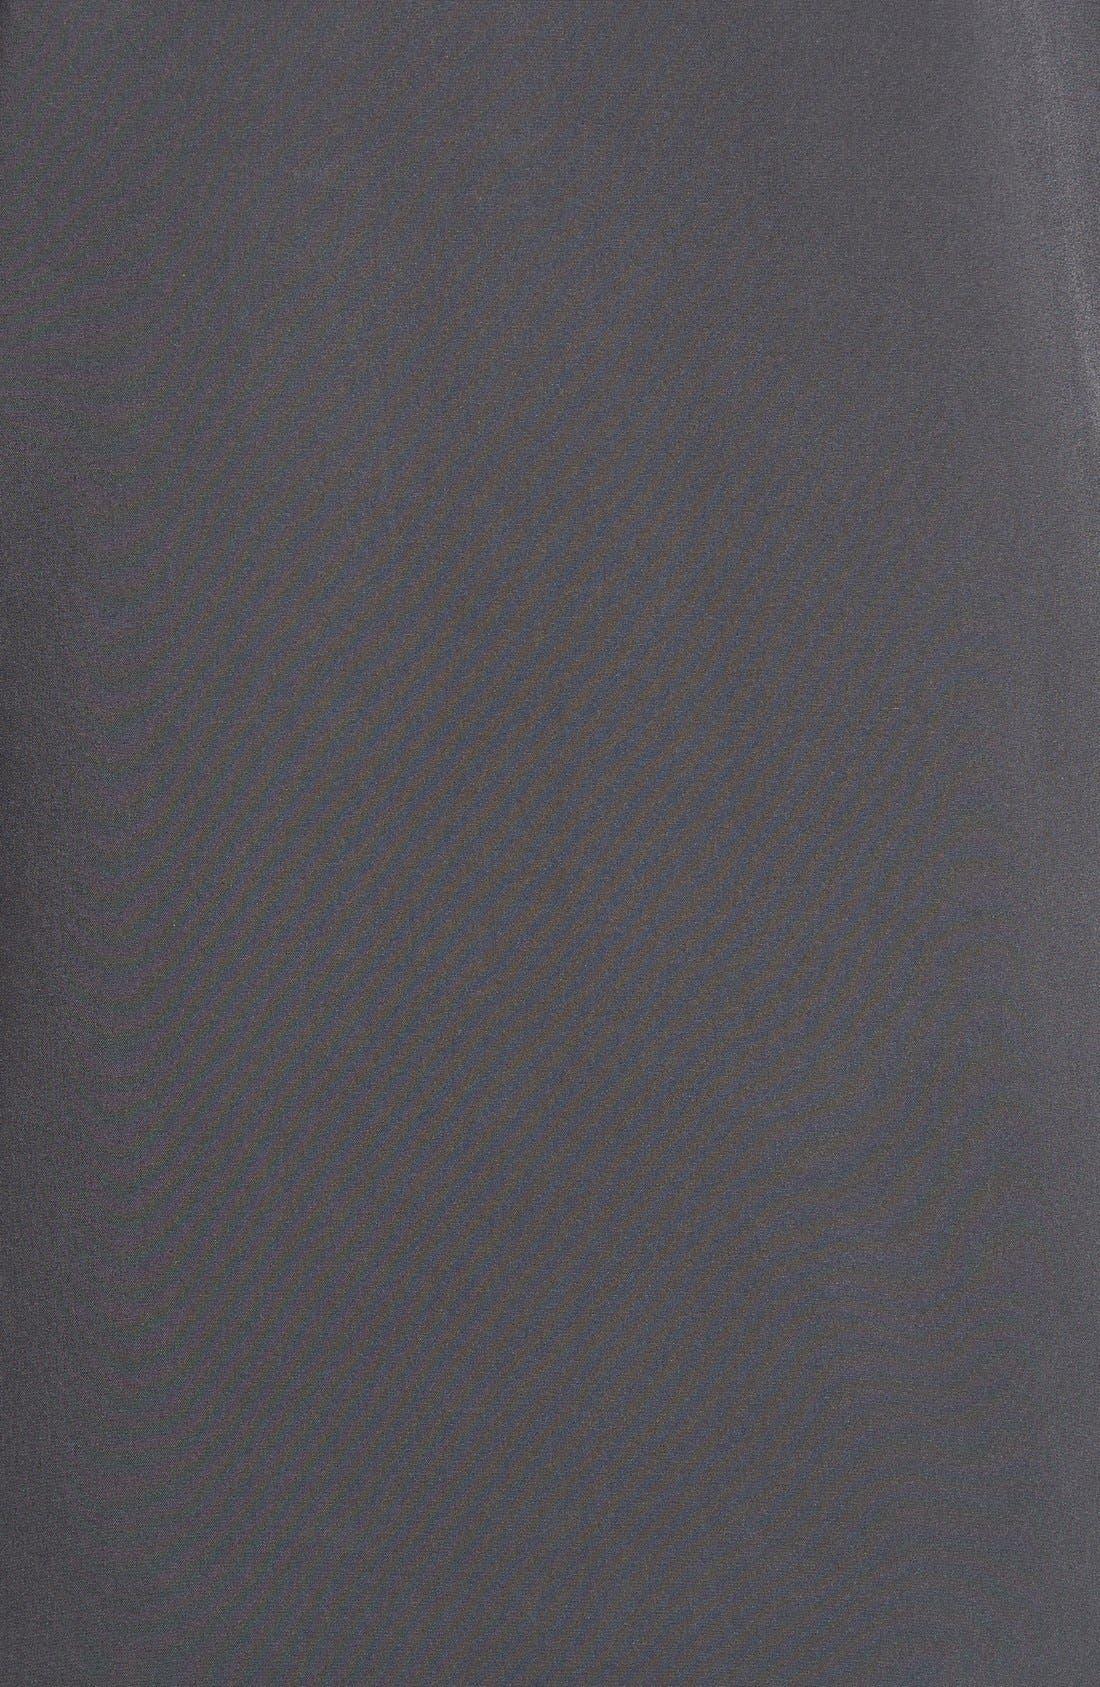 'Apex Chromium' Waterproof Thermal Jacket,                             Alternate thumbnail 5, color,                             Asphalt Grey/ Tnf Black